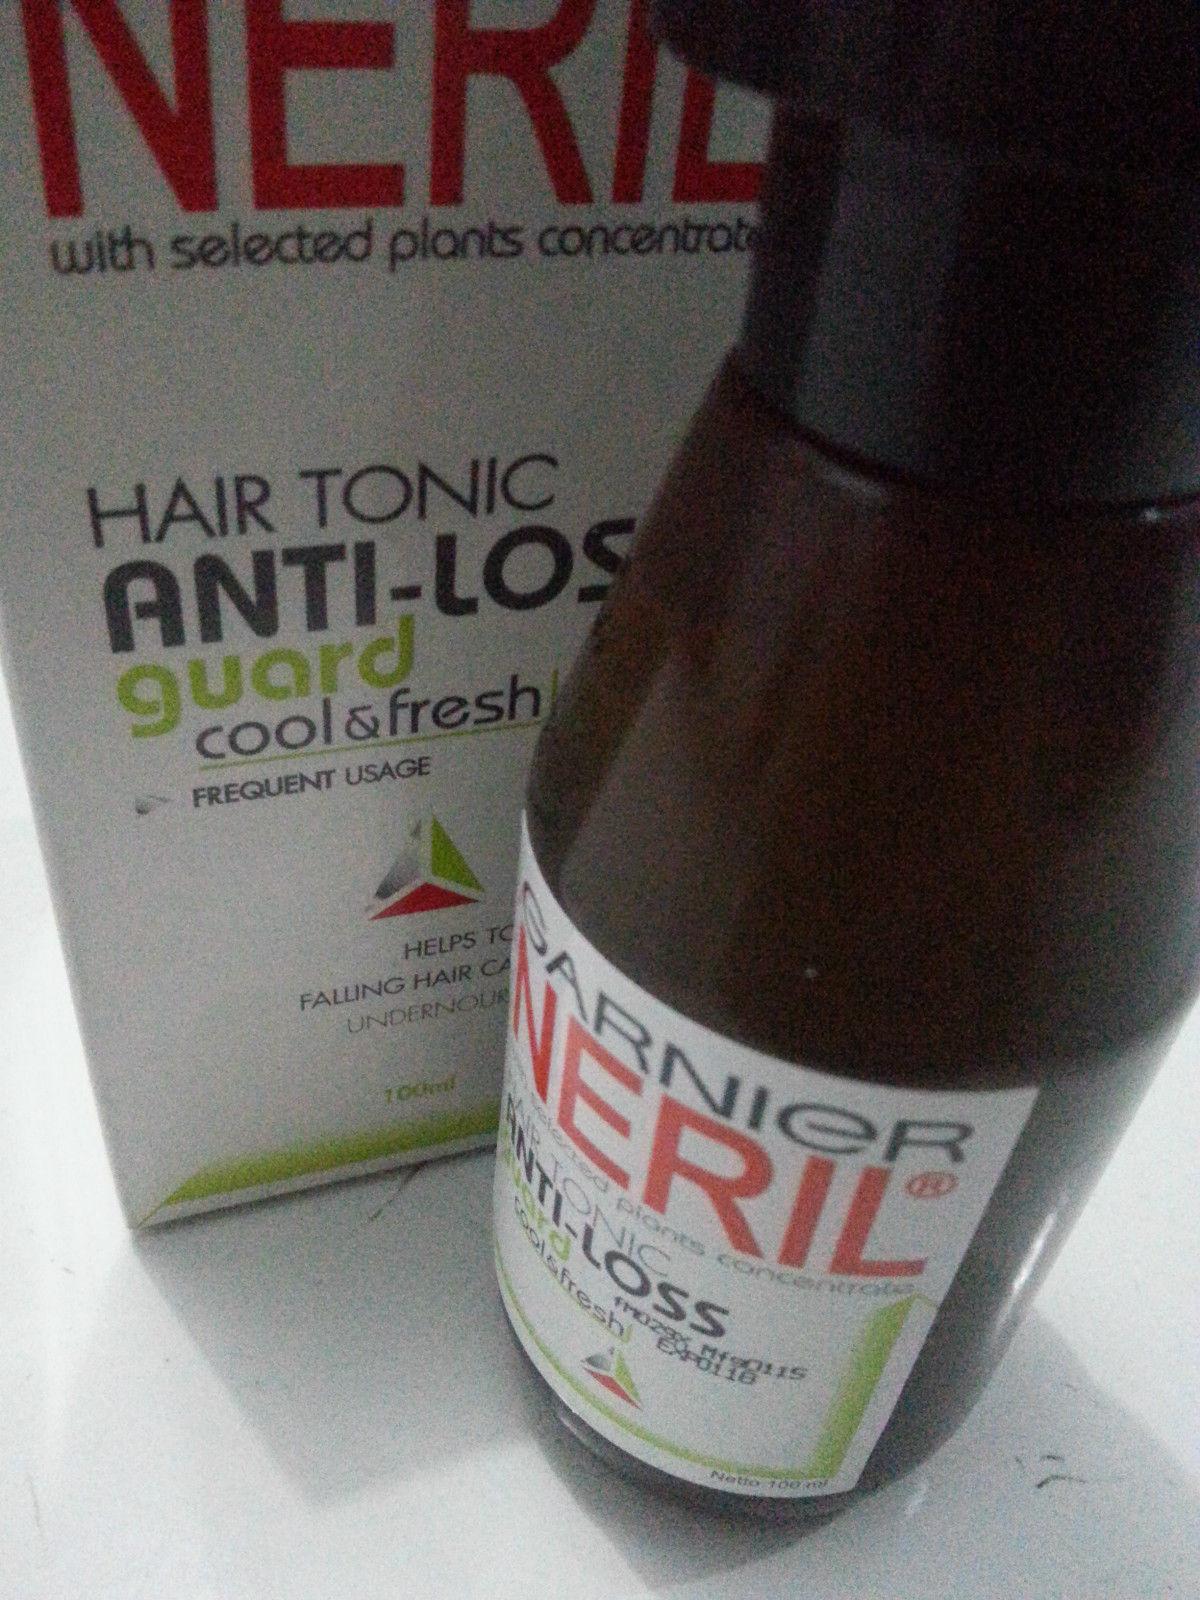 Garnier Neril Hair Tonic Anti Loss Guard And 50 Similar Items 200 Ml Cool Fresh Contains 100ml